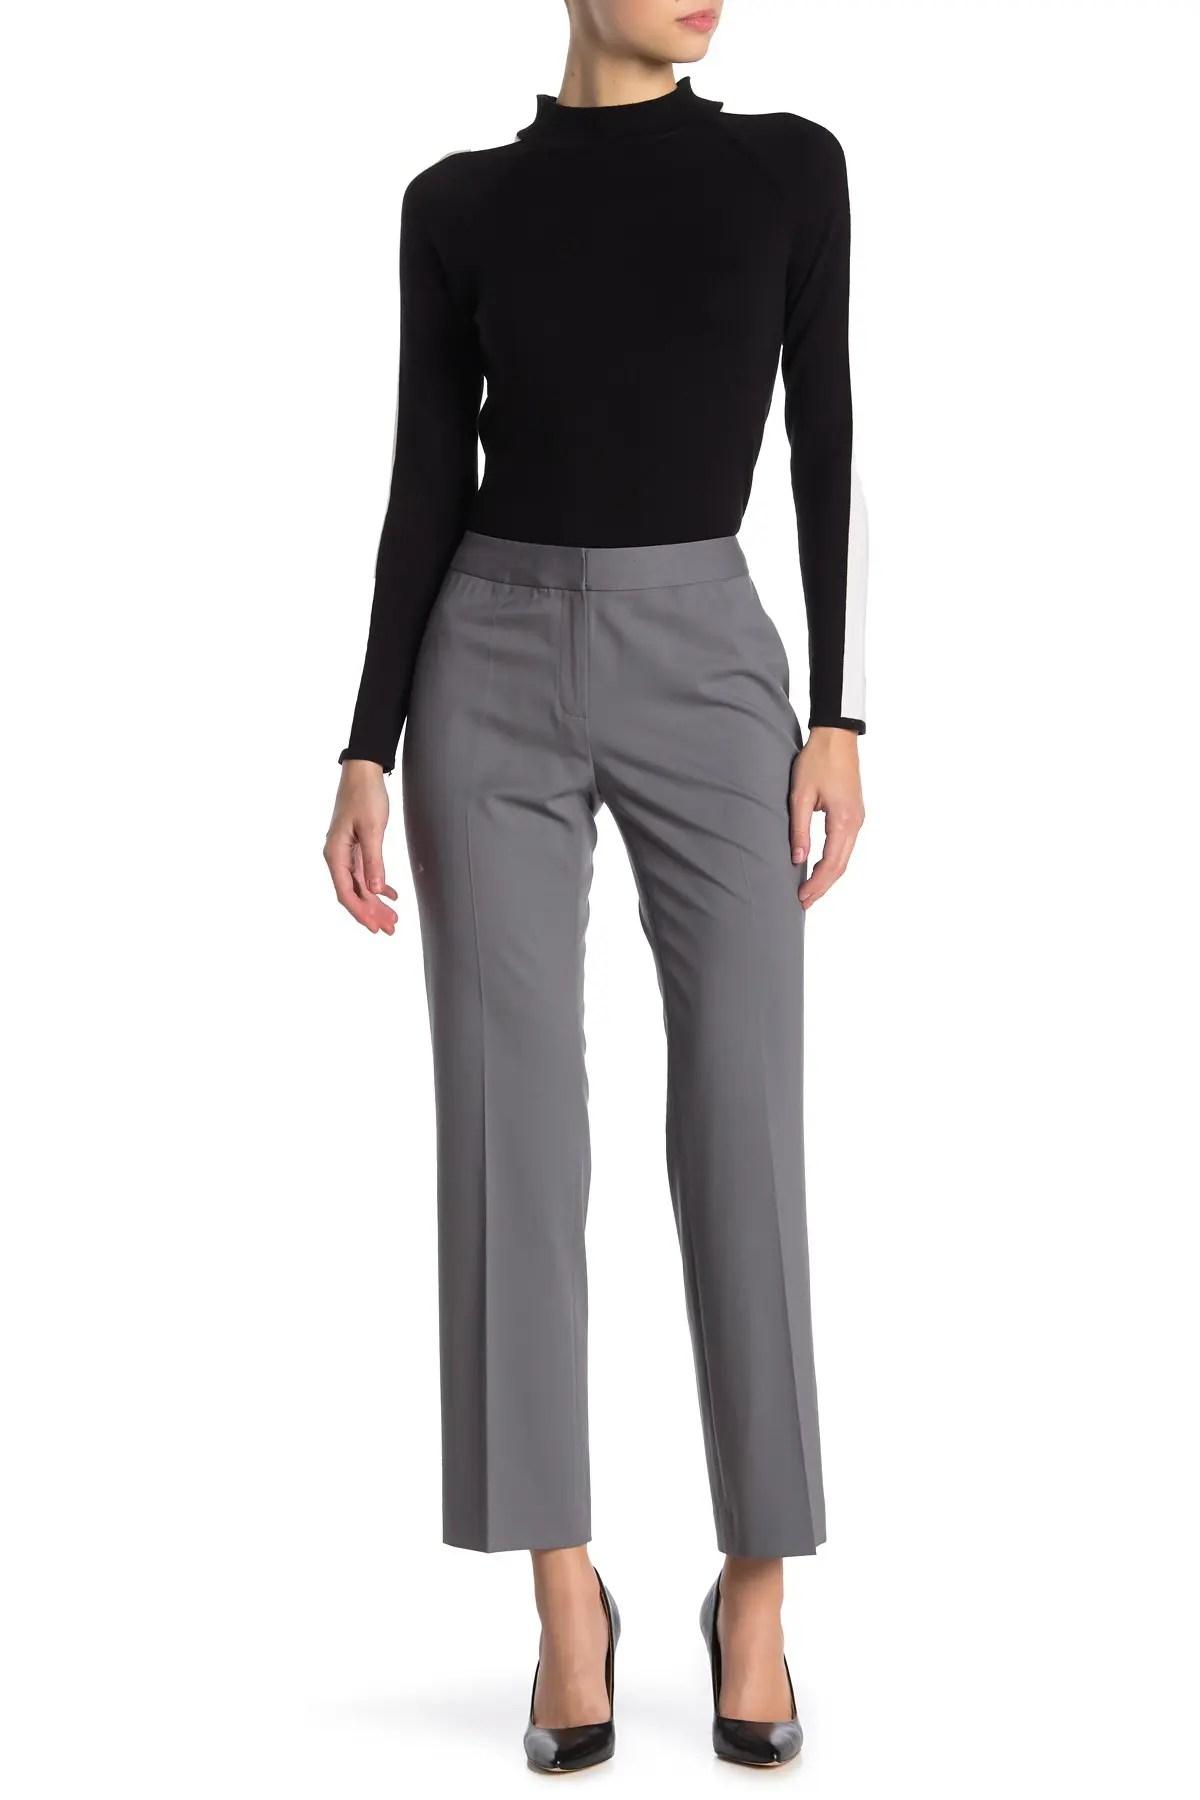 lafayette 148 new york menswear wool blend pants nordstrom rack